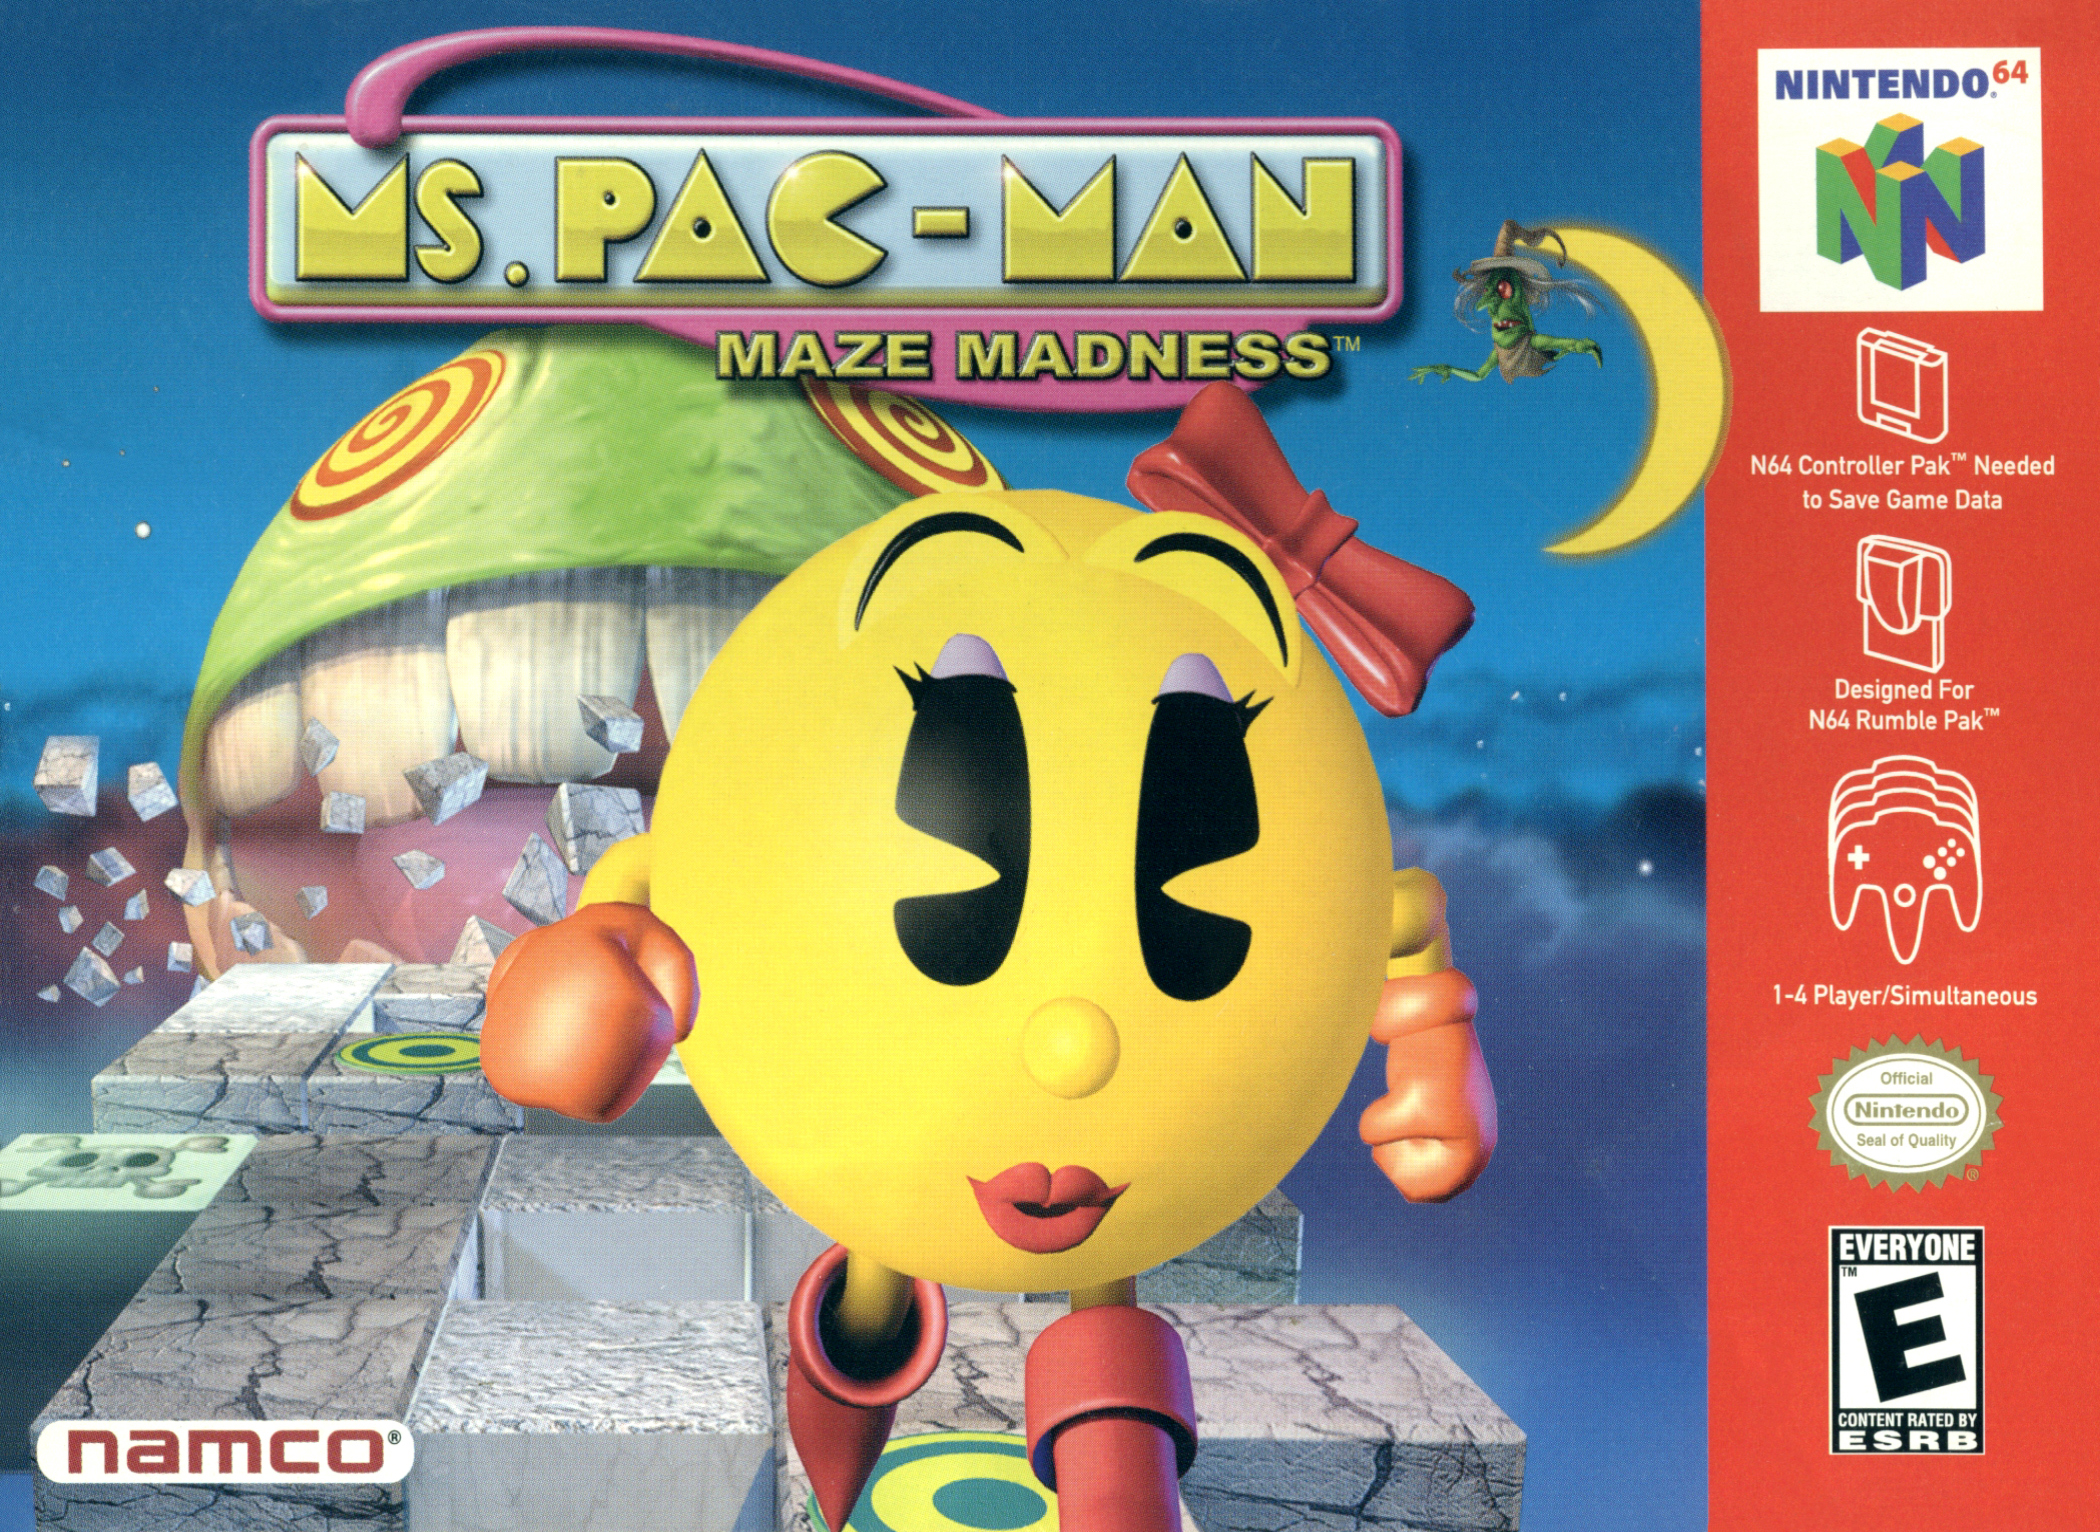 Ms. Pac-Man Maze Madness/N64